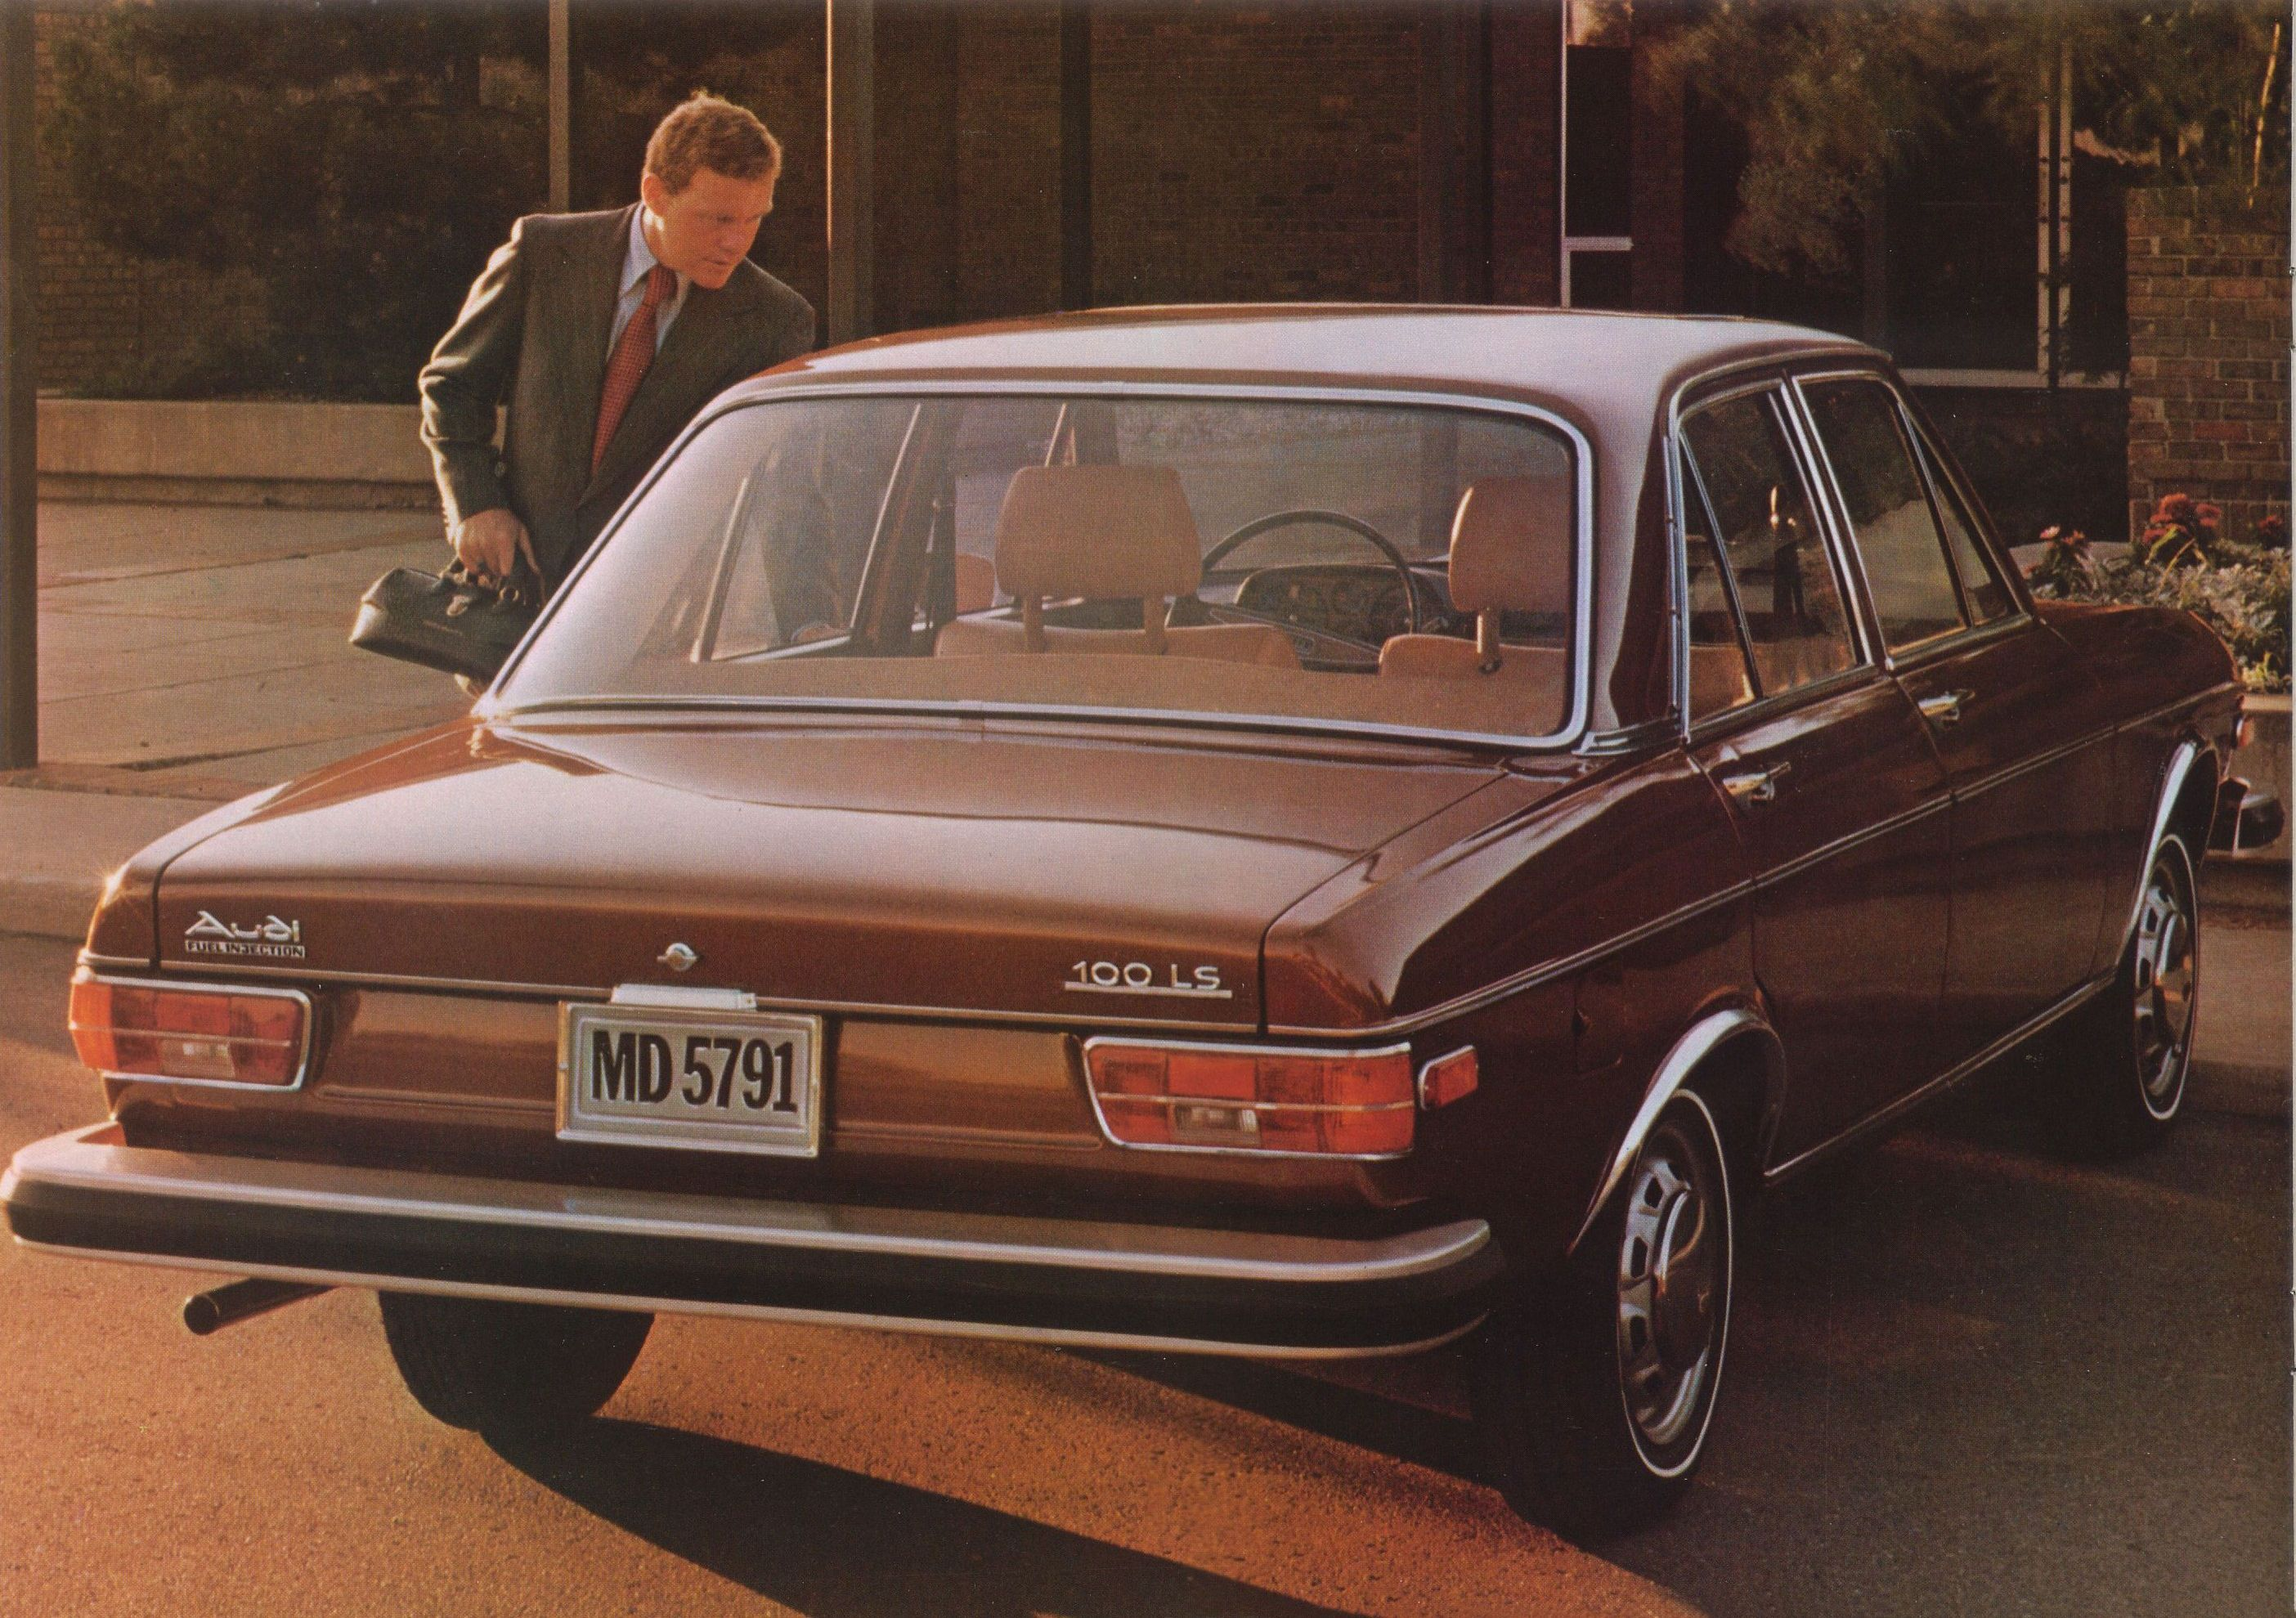 1976 Audi 100 Ls Maintenance Restoration Of Old Vintage Vehicles